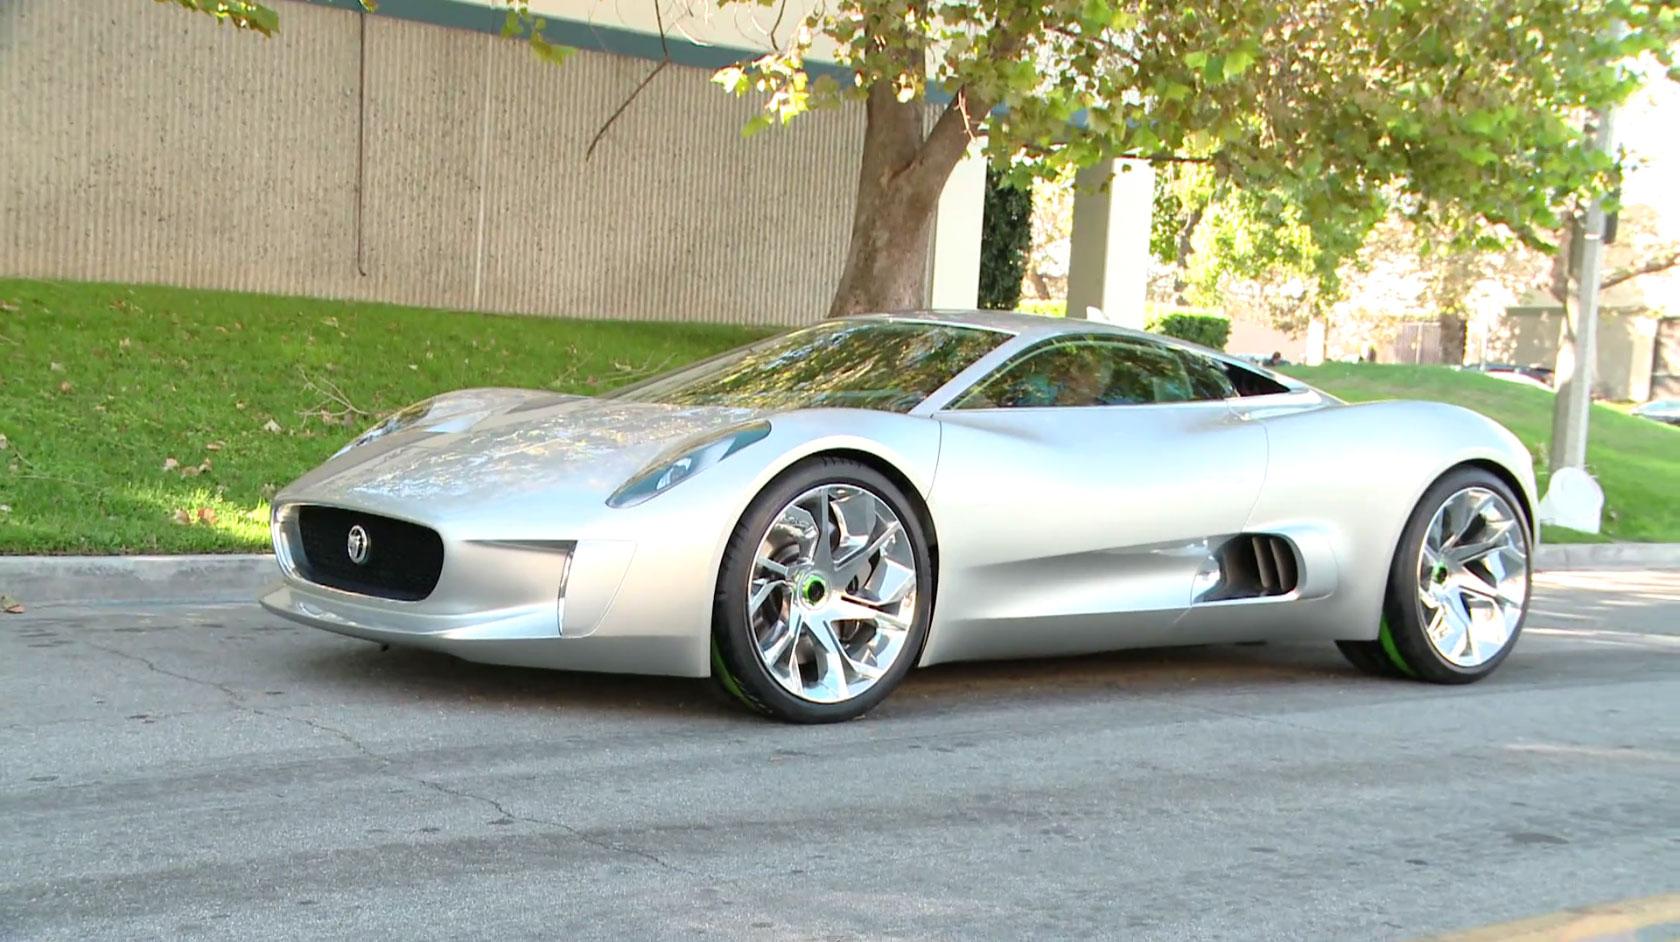 Jaguar C X75 Hybrid Supercar